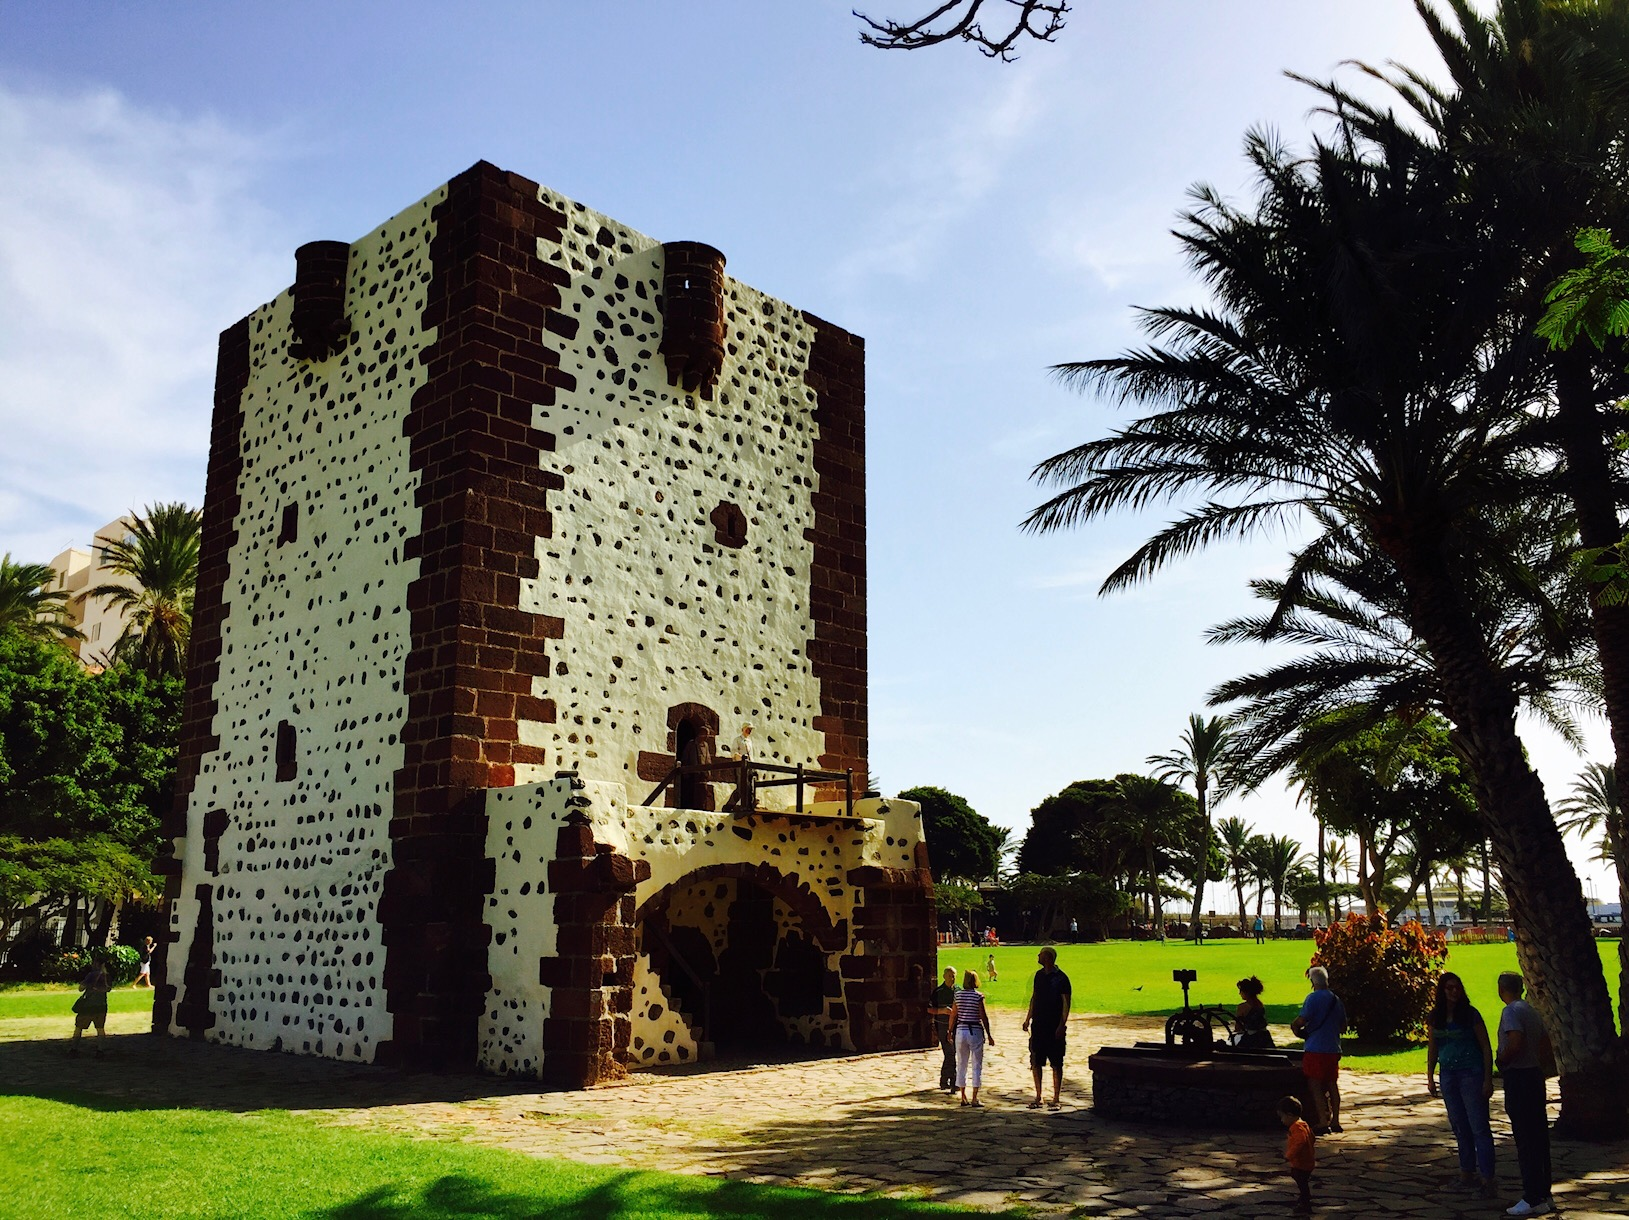 Alter Wehrturm im Park bei San Sebastian, La Gomera